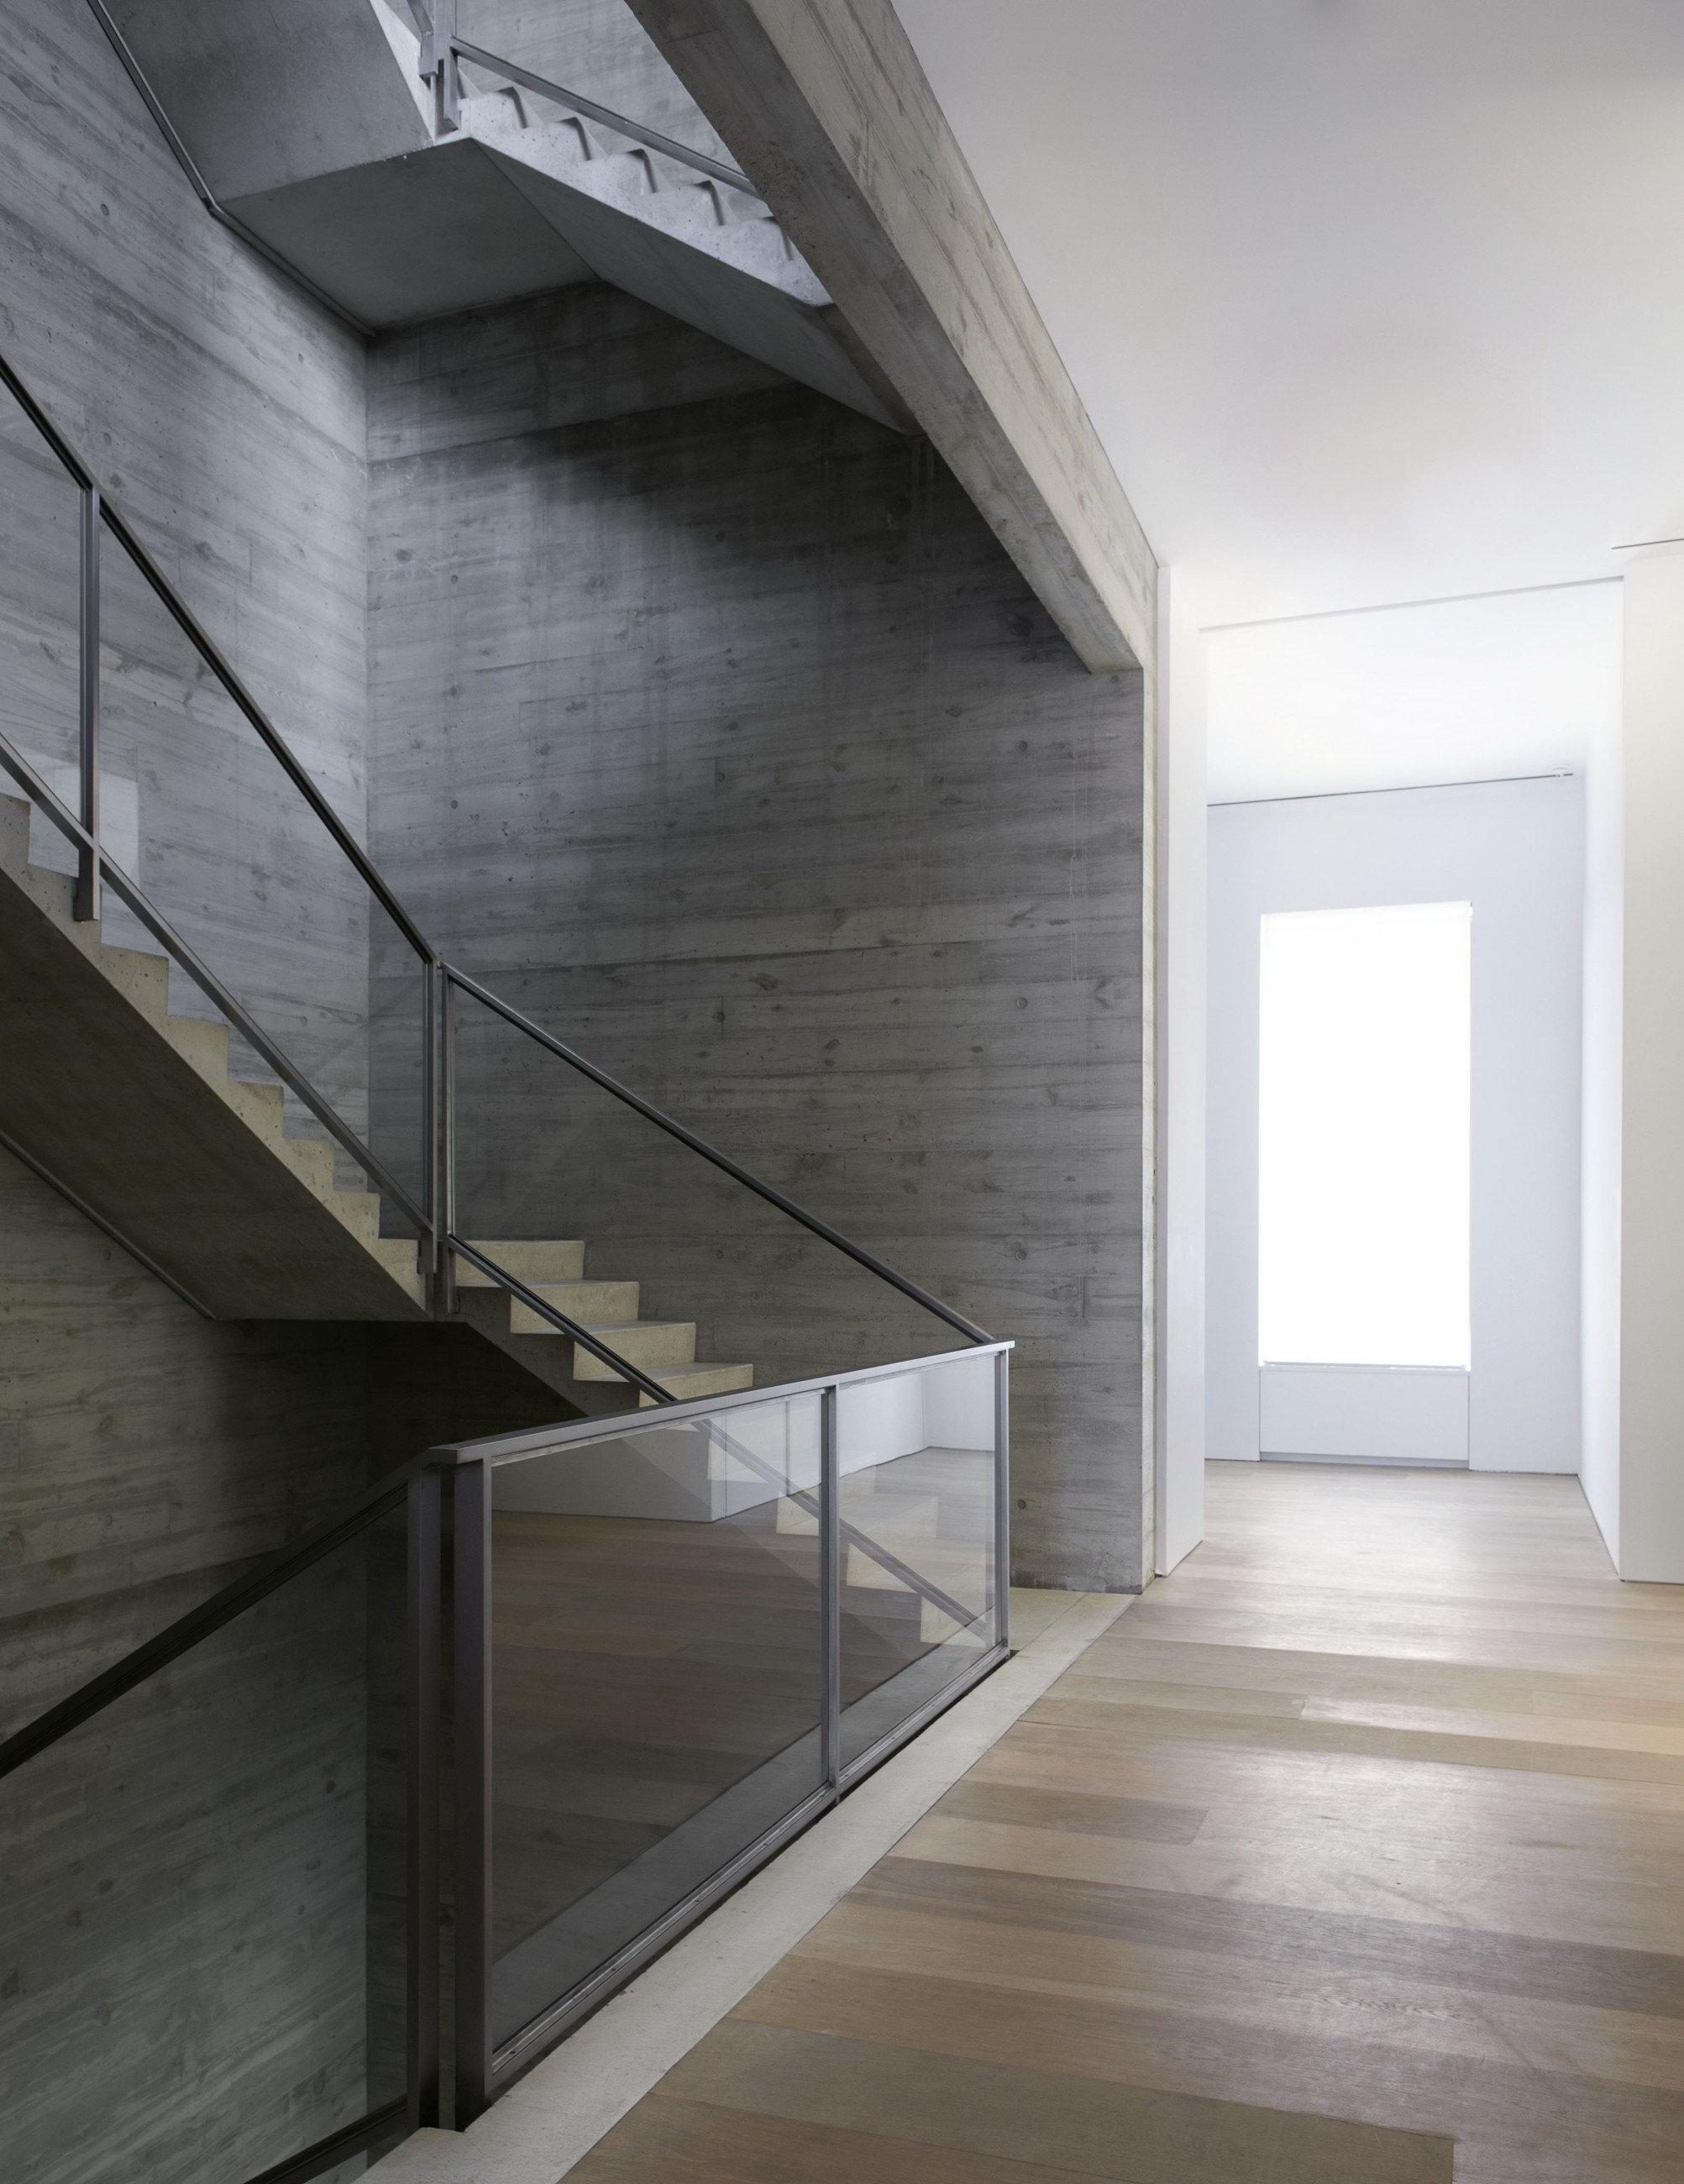 David Zwirner 20th Street Selldorf Architects New York